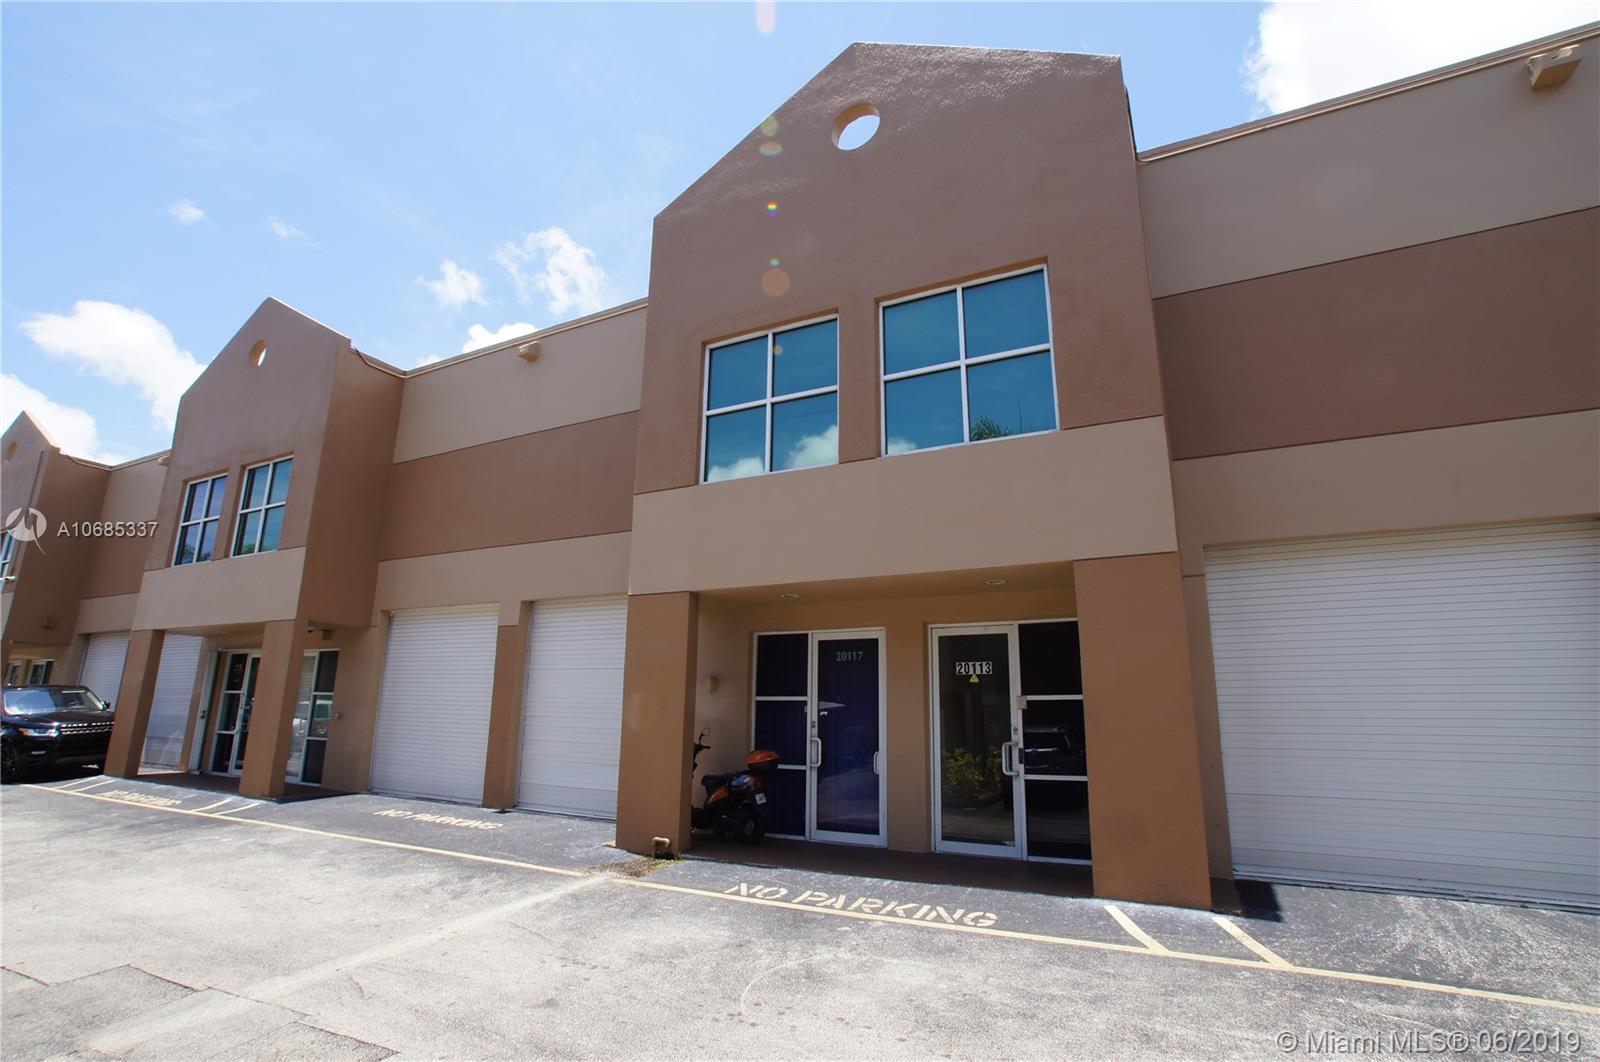 20113 NE 16th PL 20113-17-21, Miami, FL 33179